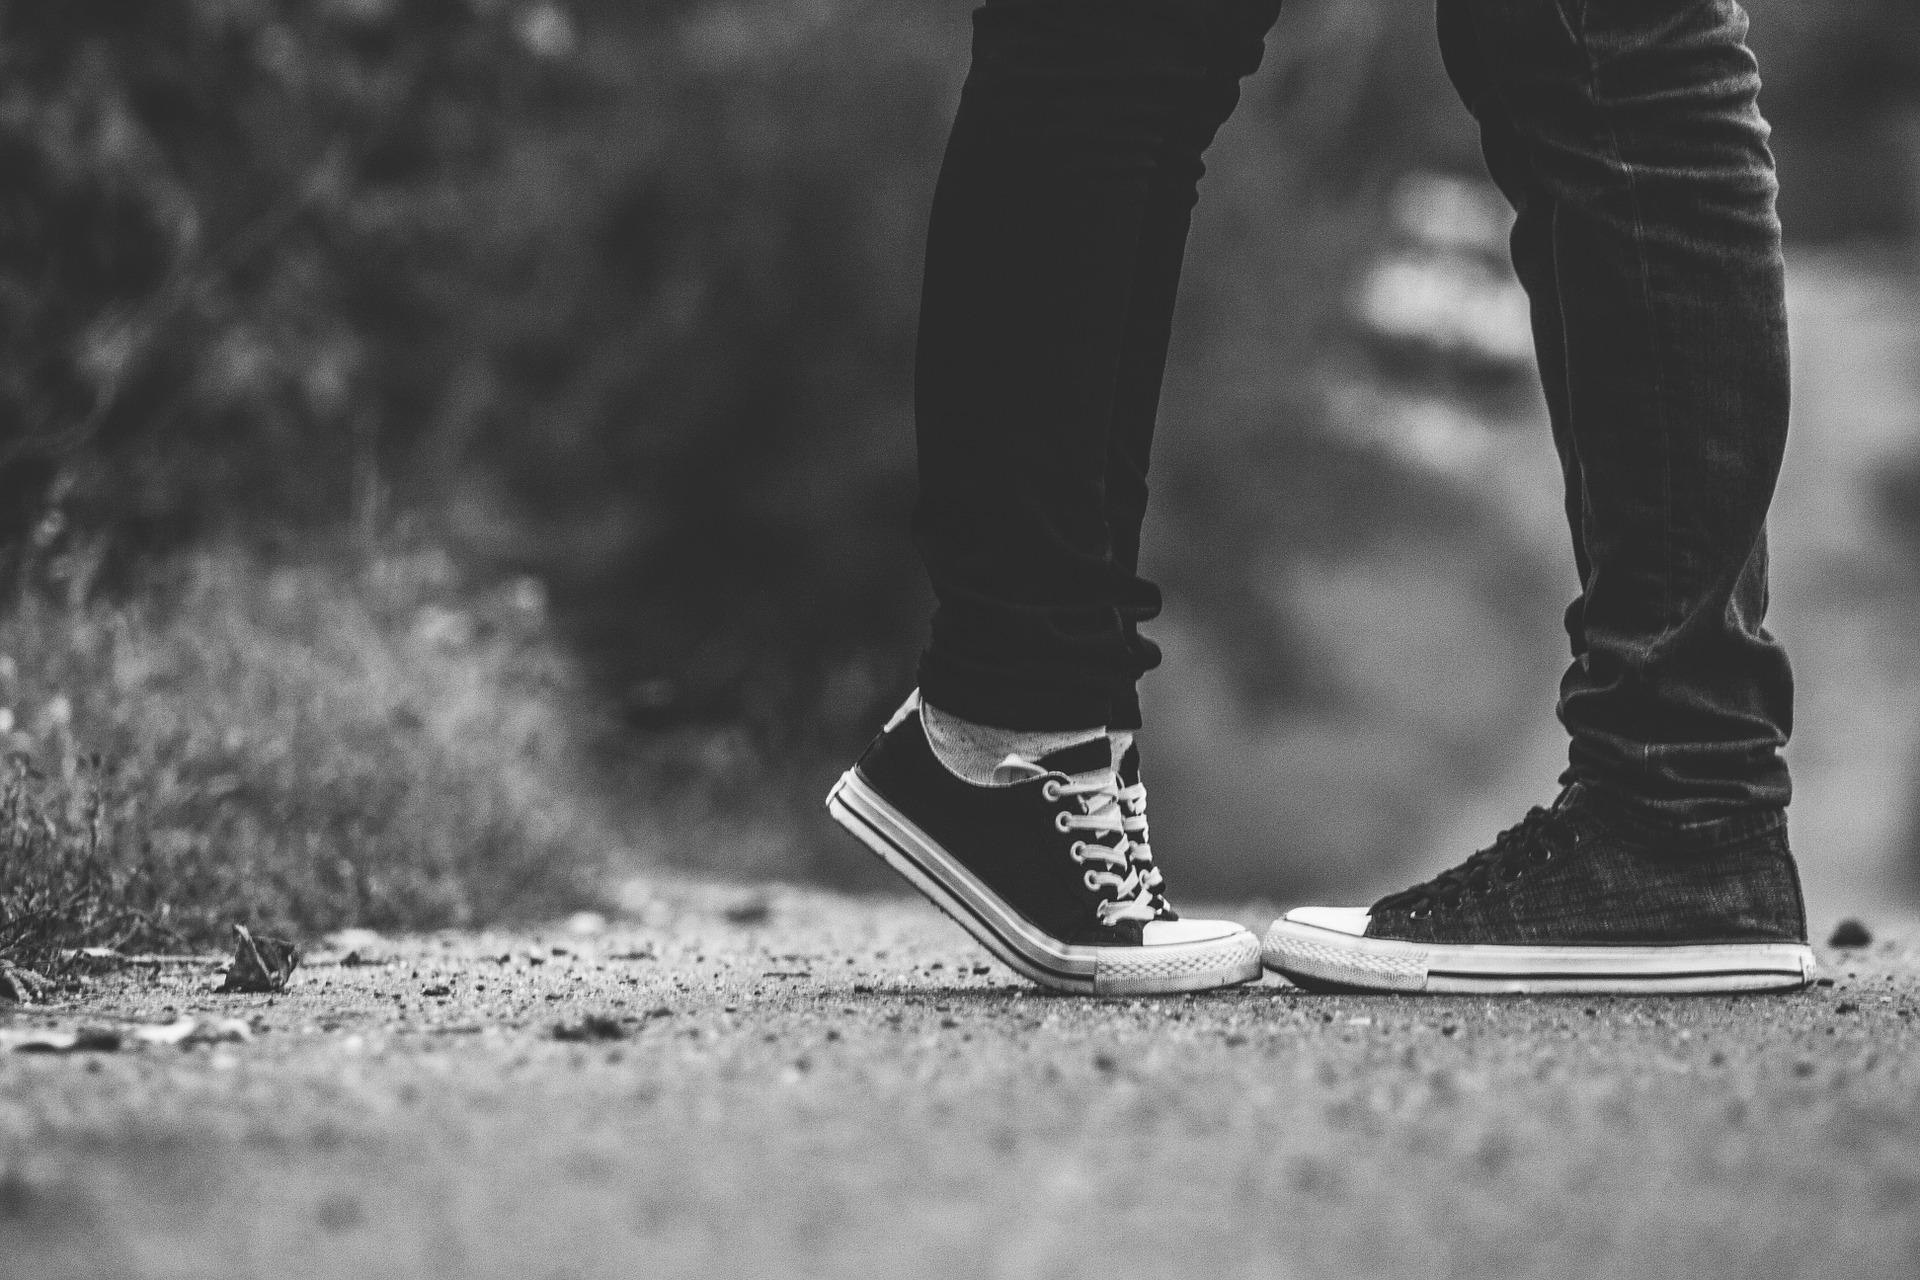 feet-1007711_1920